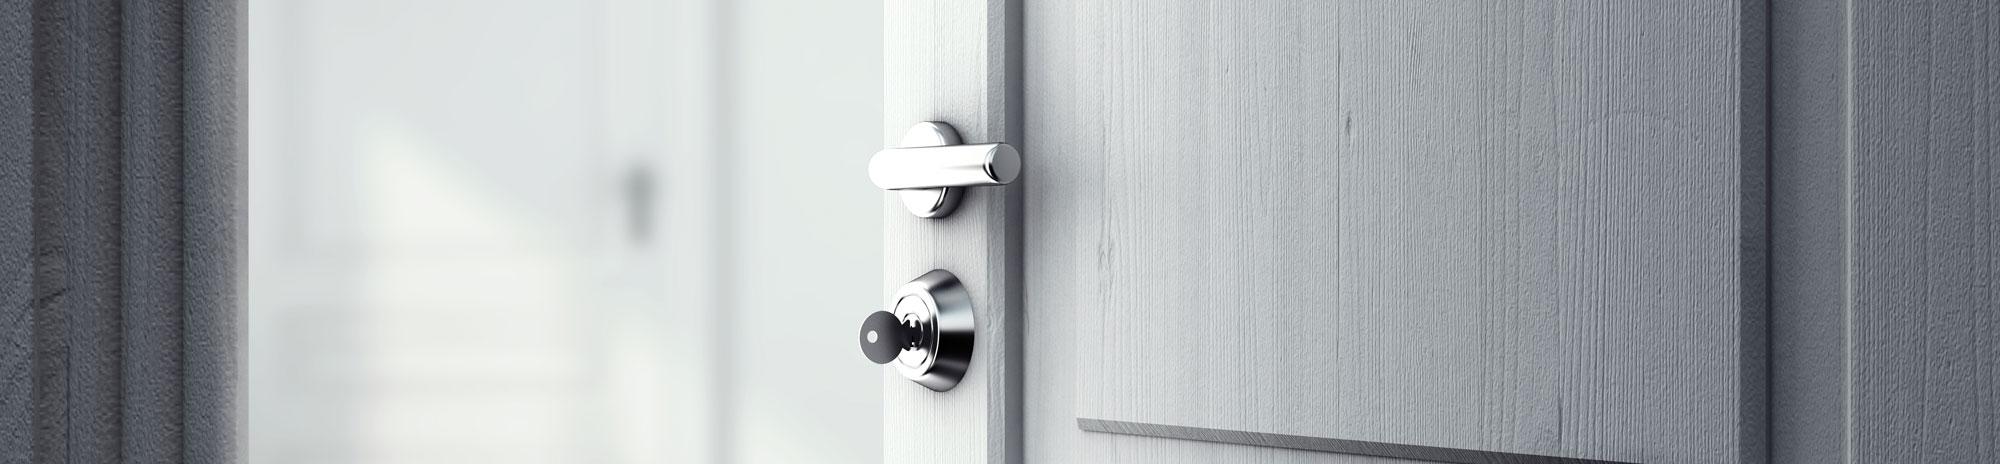 Porte interne rossi casa srl verbania villadossola - Tipi di porte interne ...